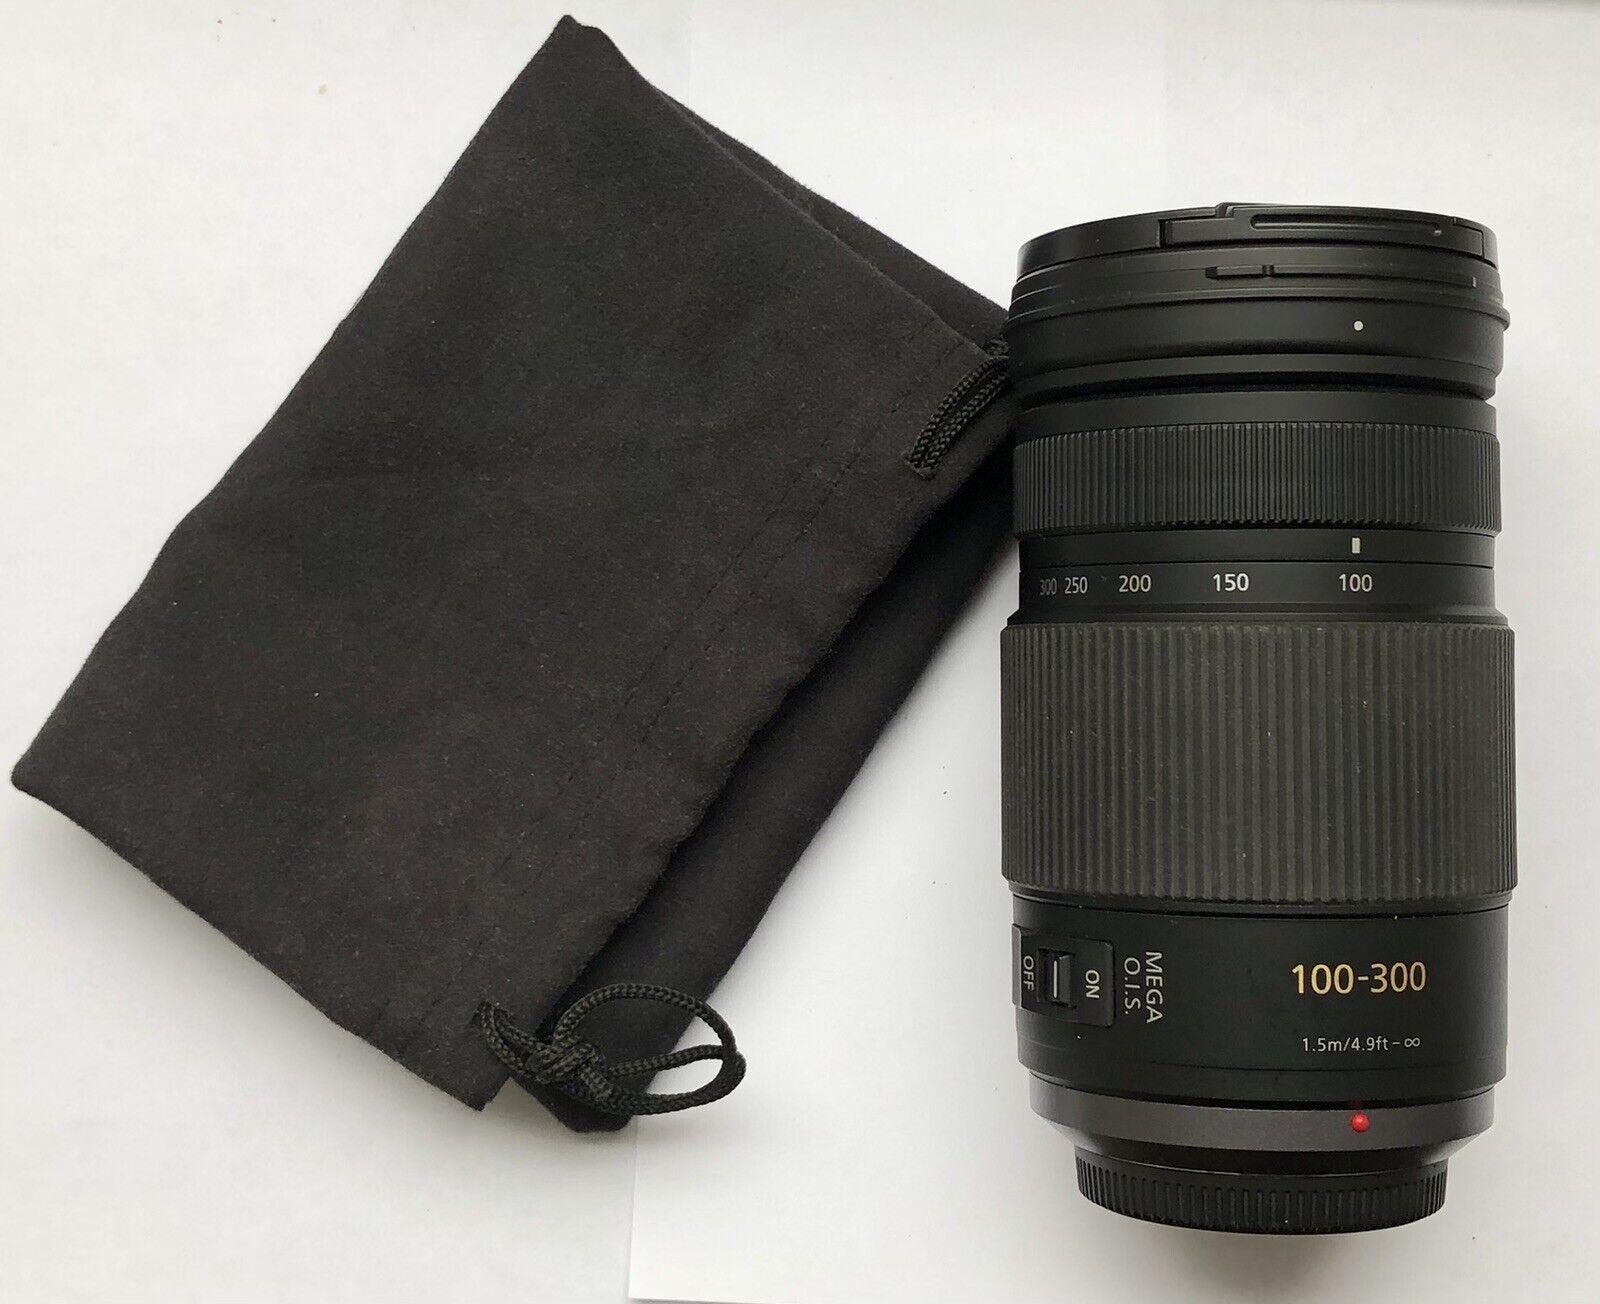 Panasonic LUMIX G VARIO 100-300mm F4.0-5.6 MEGA O.I.S H-FS100300 - $300.00